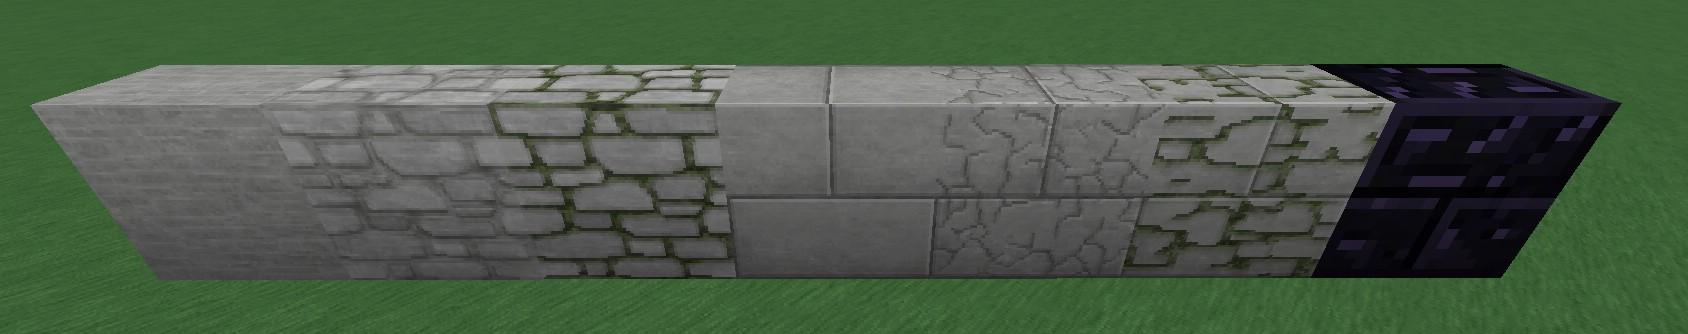 Dungeons-blocks-mod-5.jpg